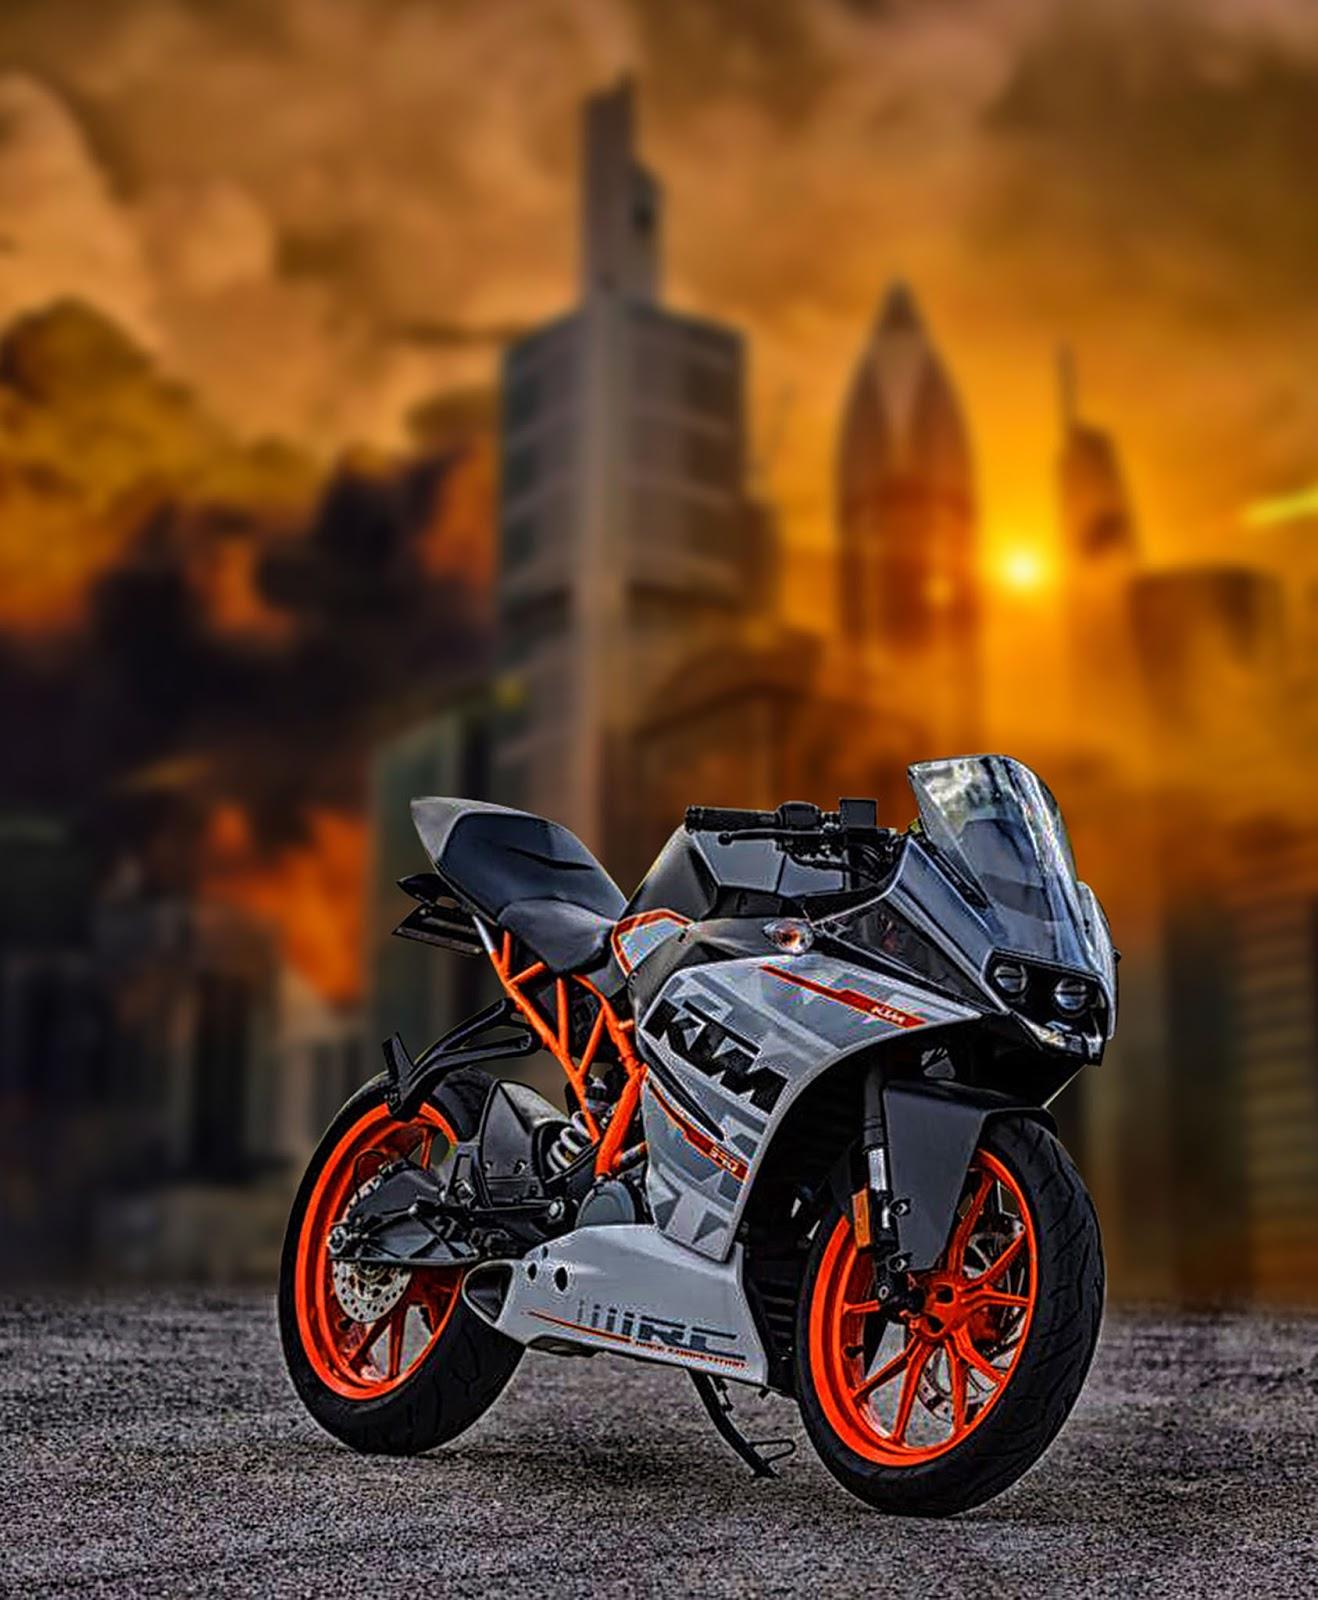 Best Background Images Hd For Picsart Editing - impremedia.net